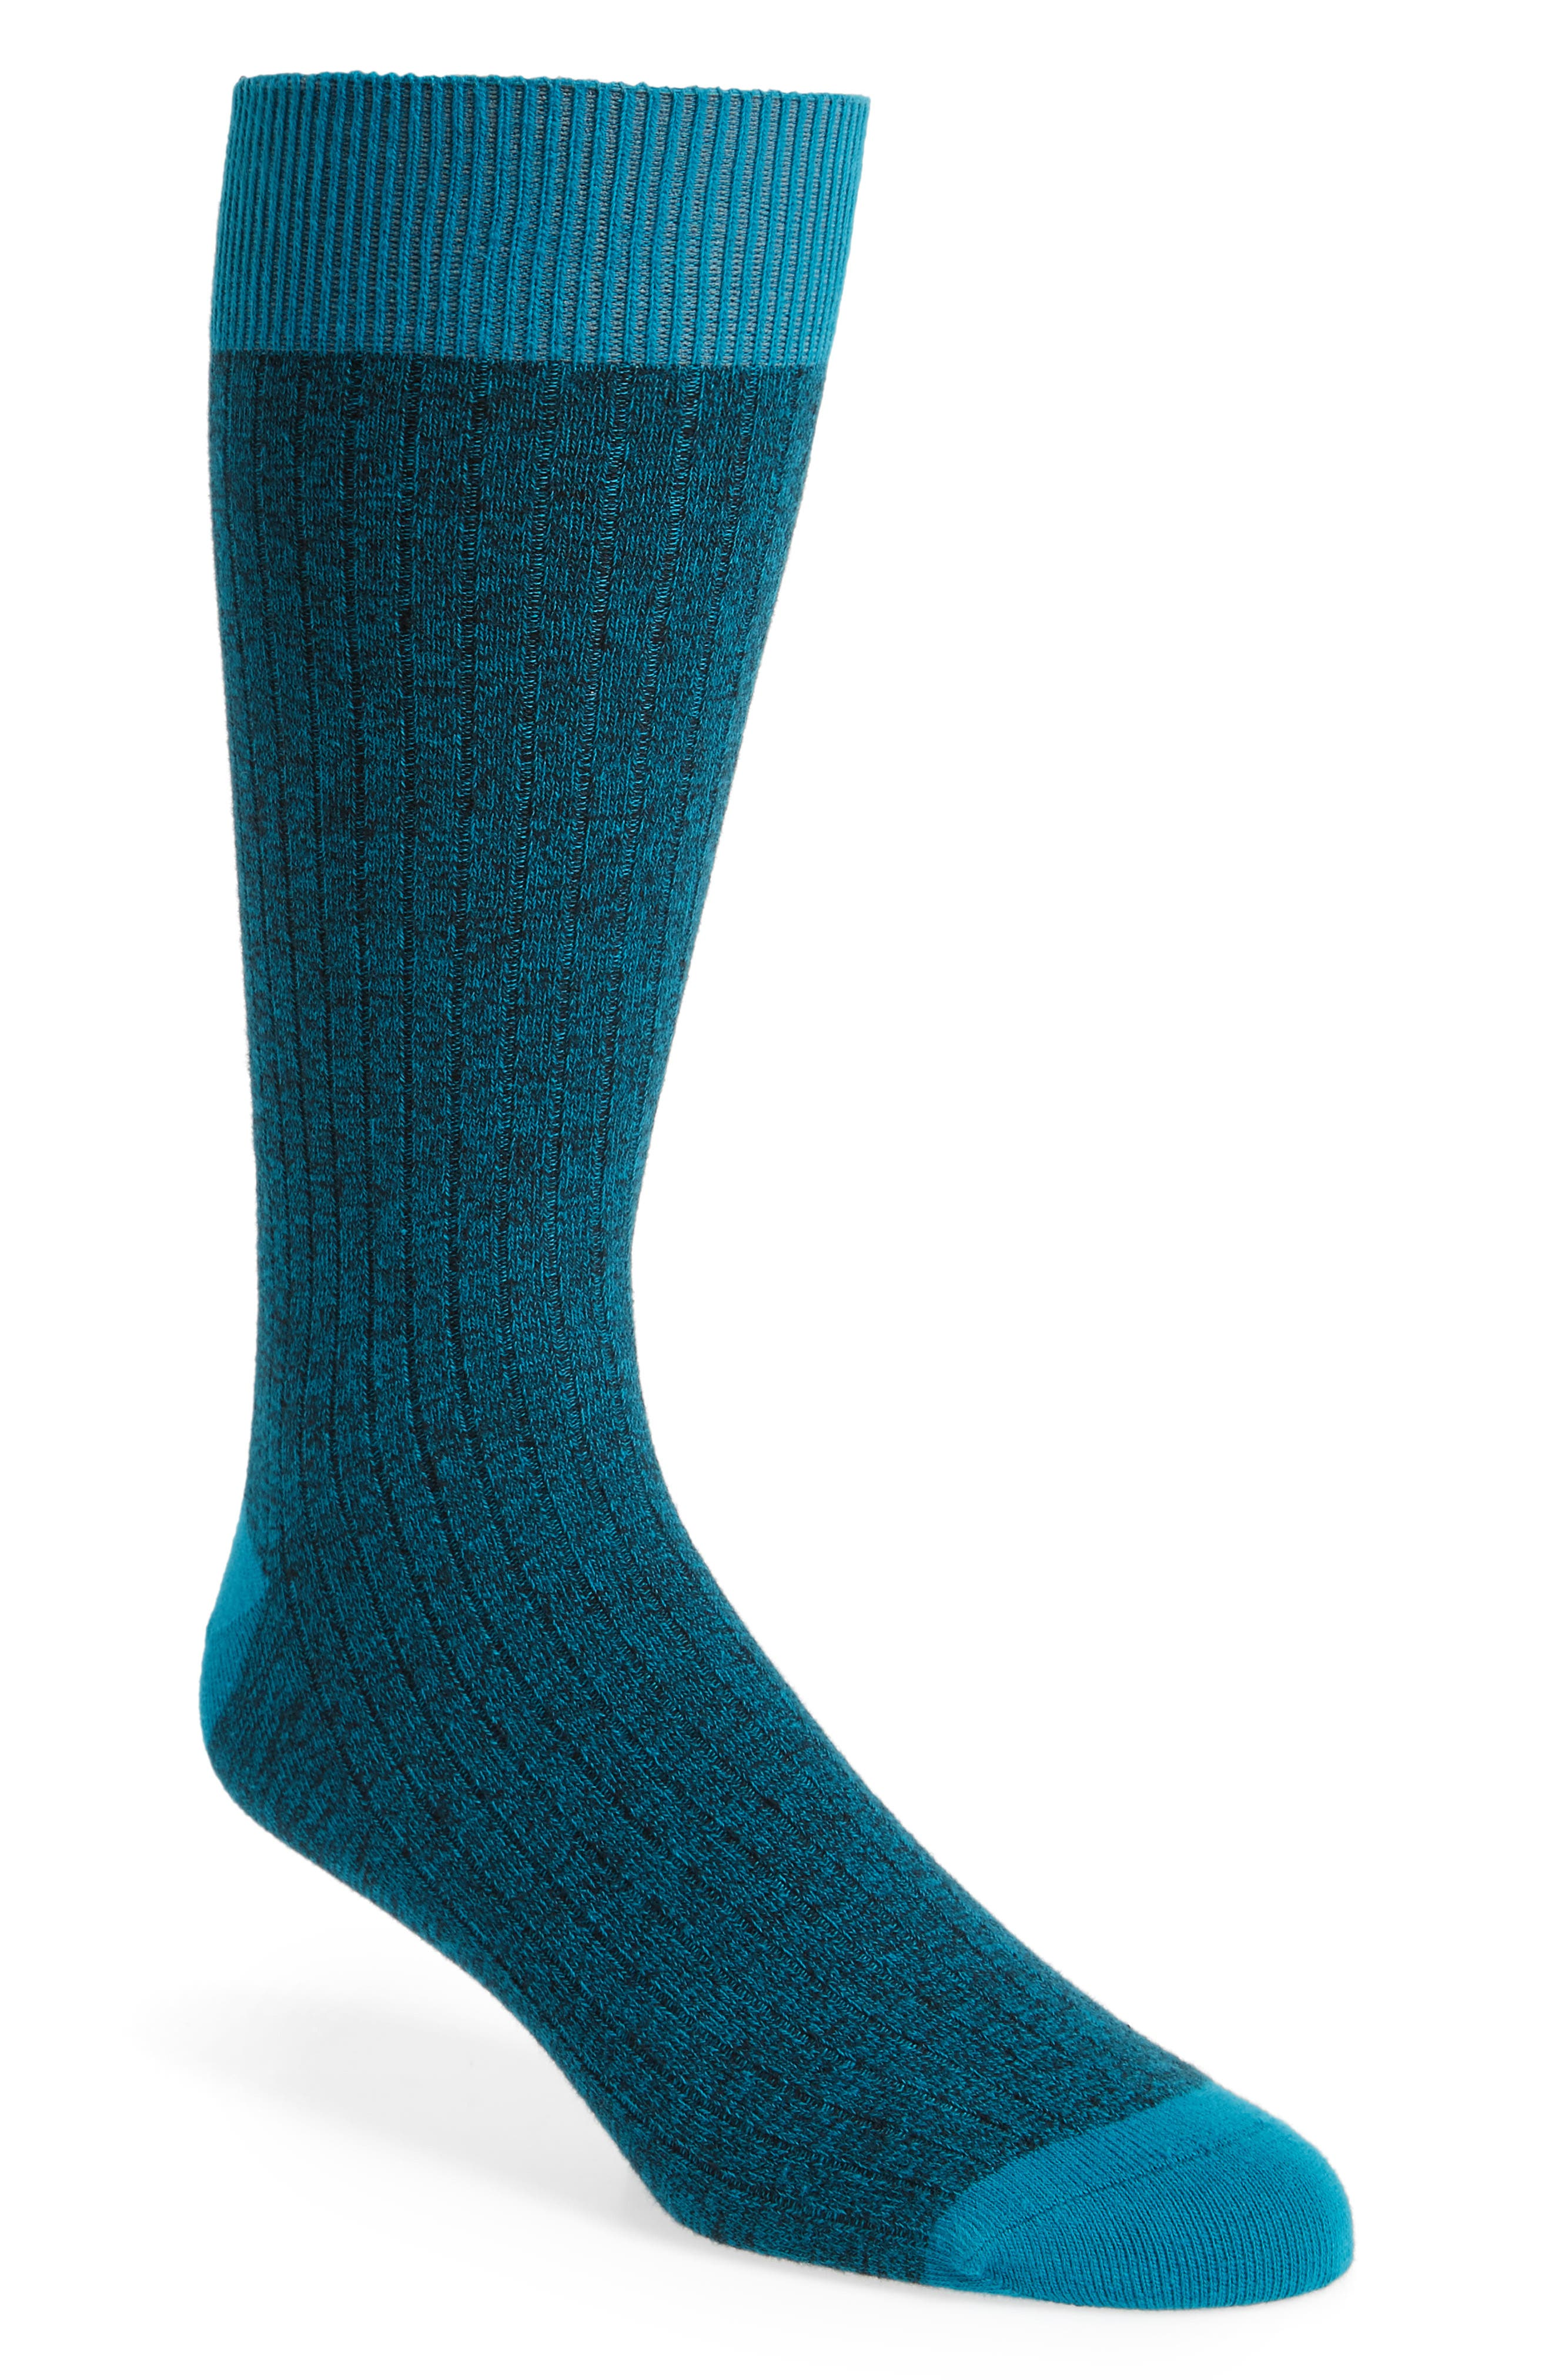 Polbray Ribbed Socks,                         Main,                         color, Teal